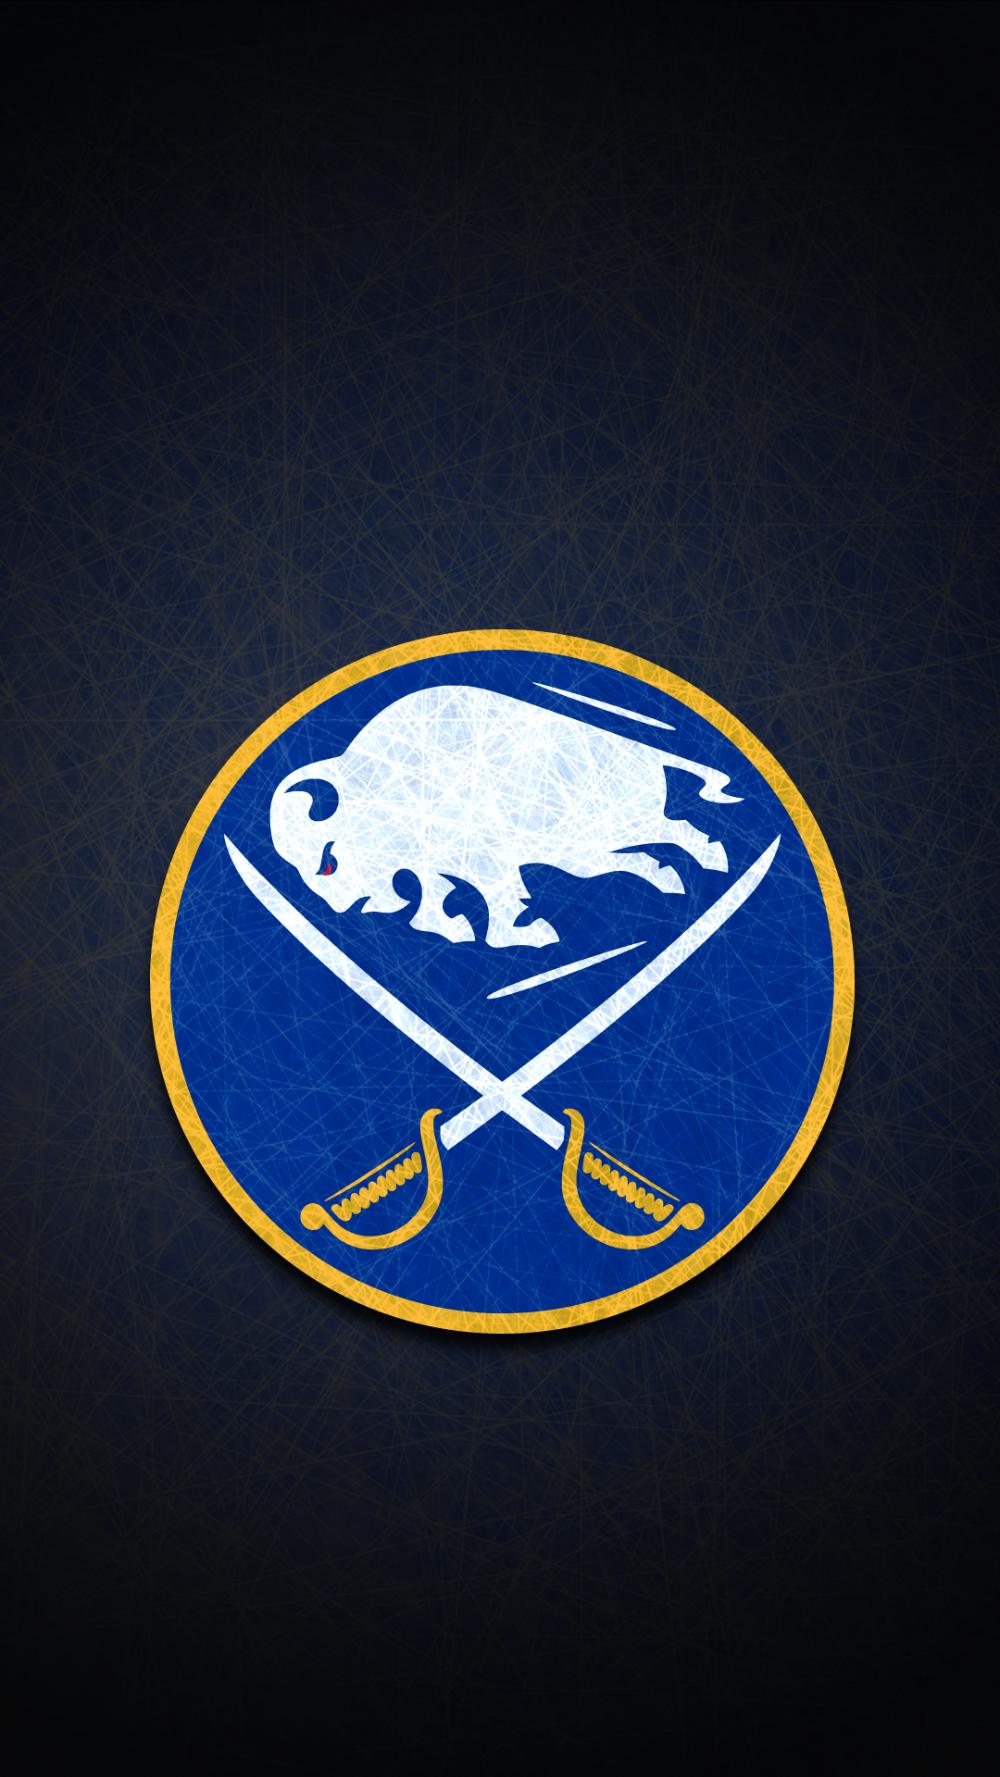 2021 Buffalo Sabres Wallpapers Pro Sports Backgrounds V 2021 G Hokkej